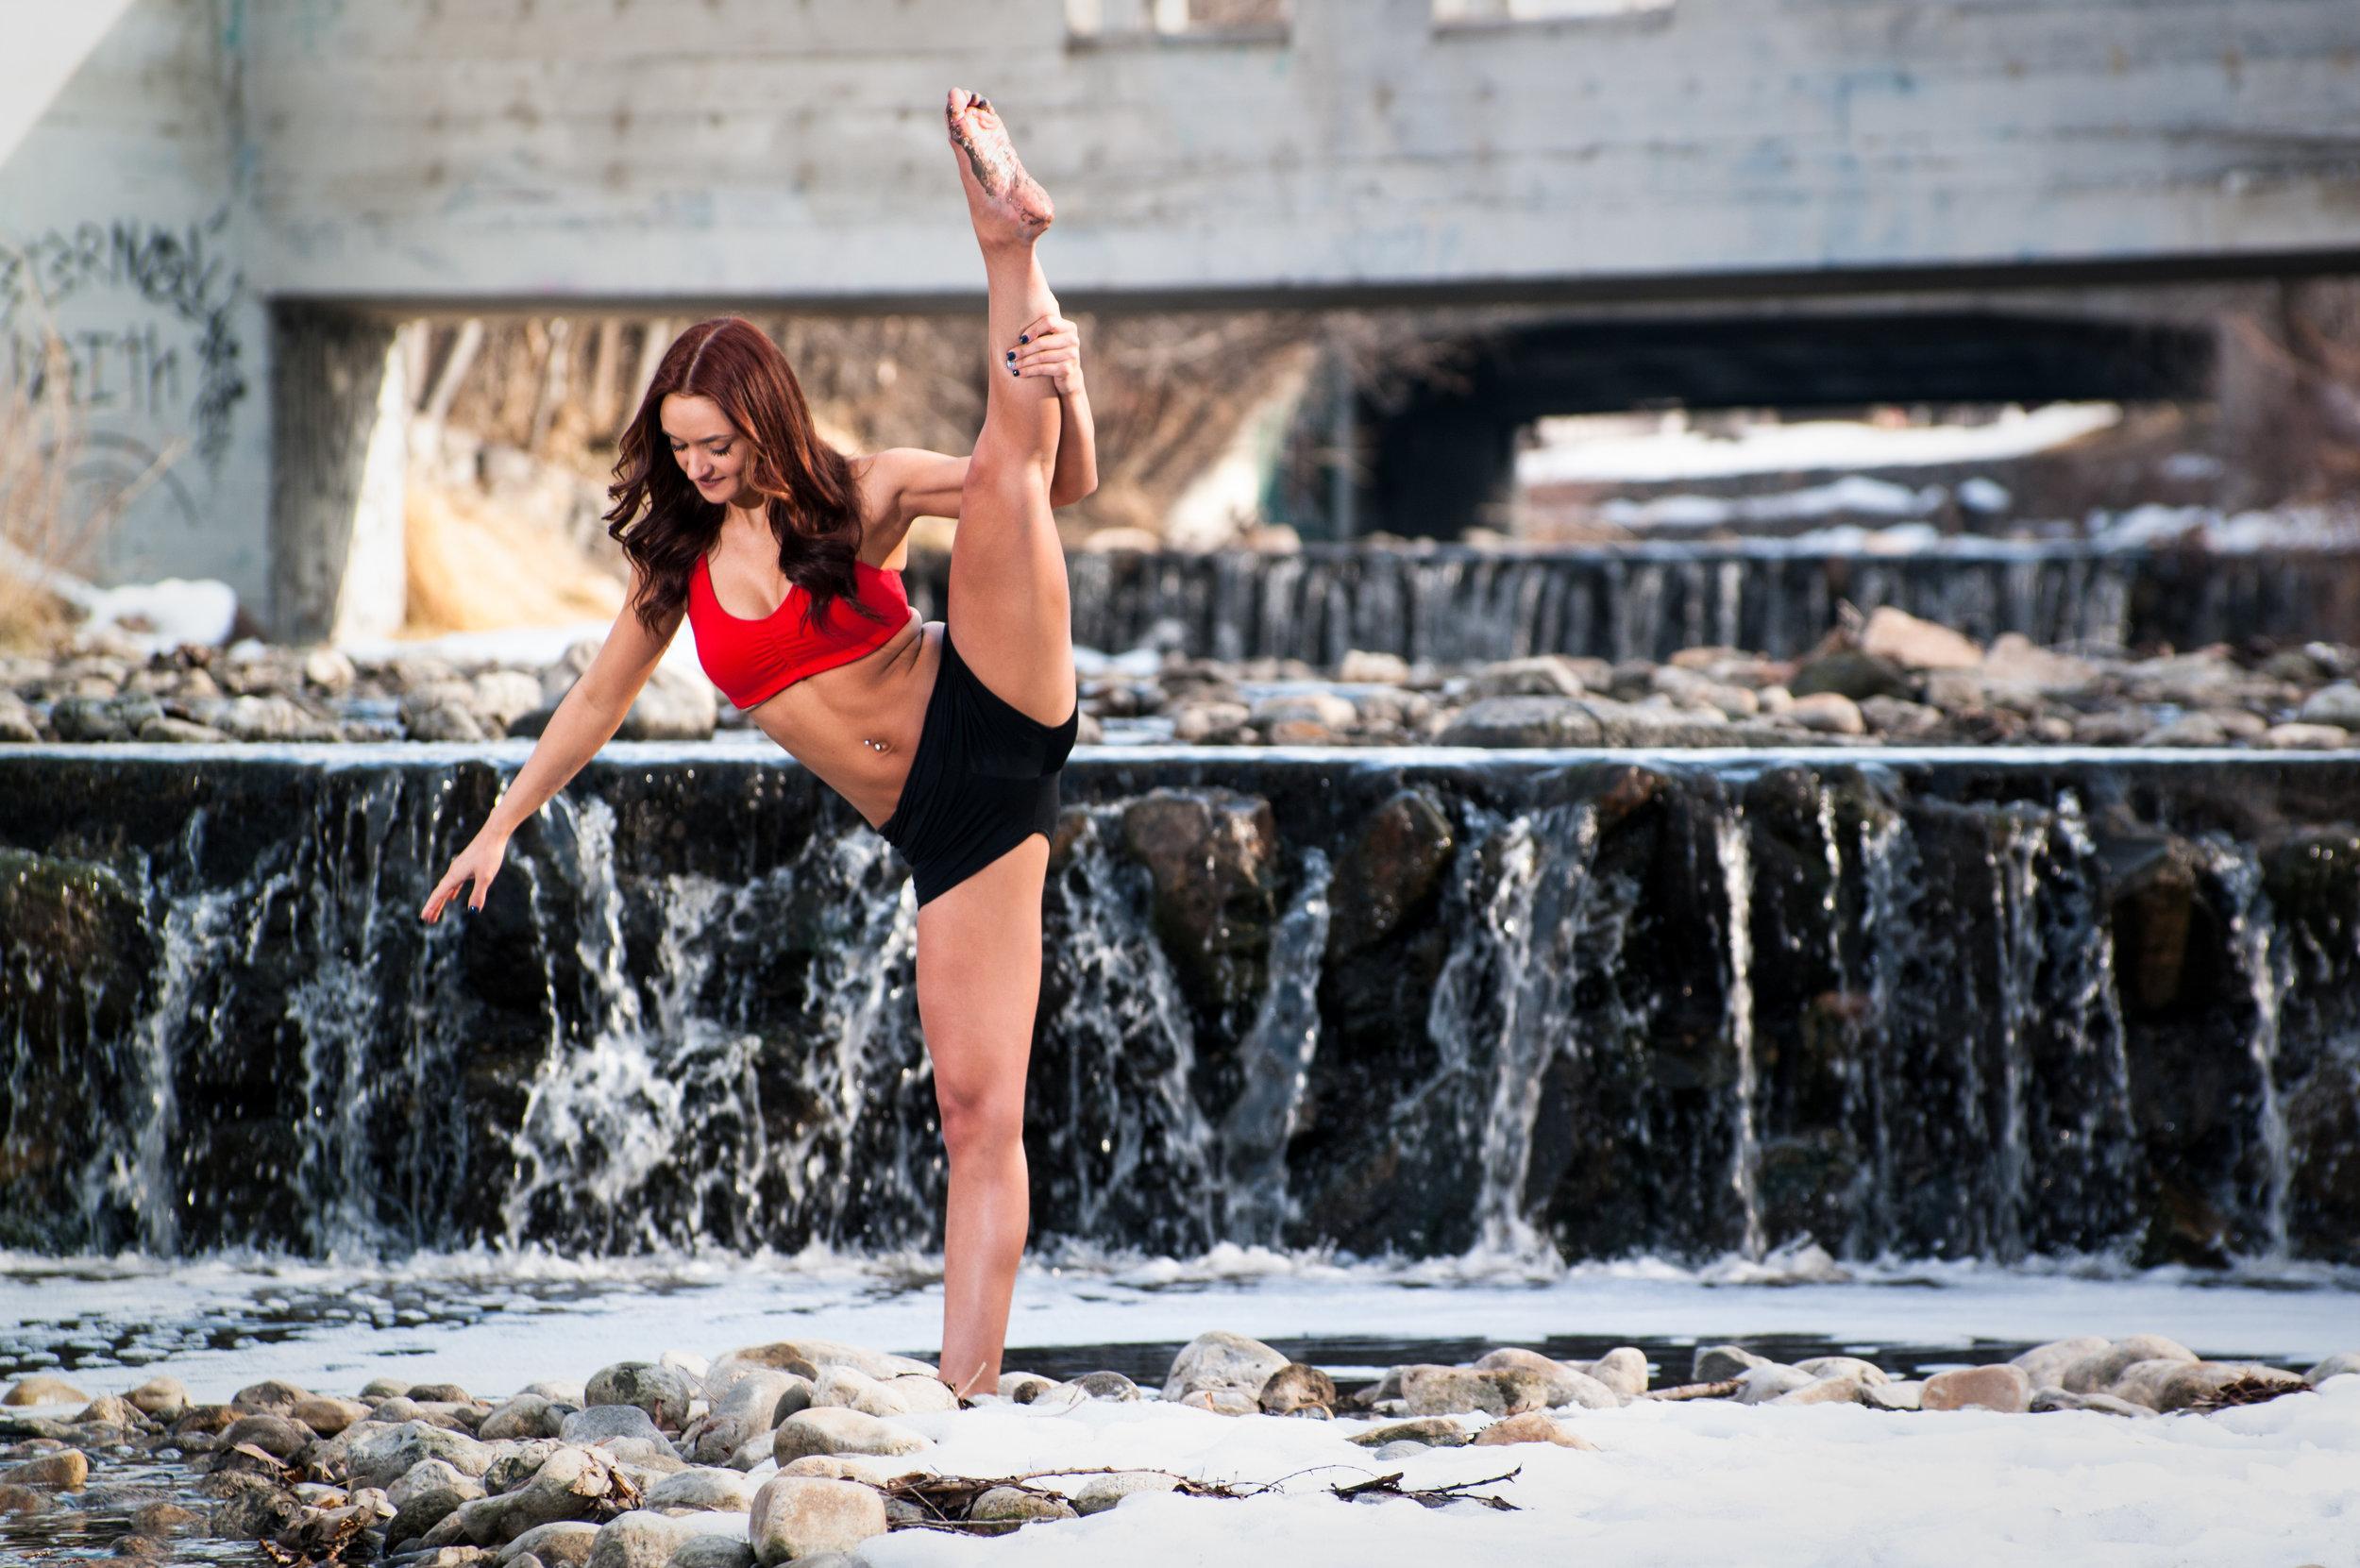 Waterfall dancer.